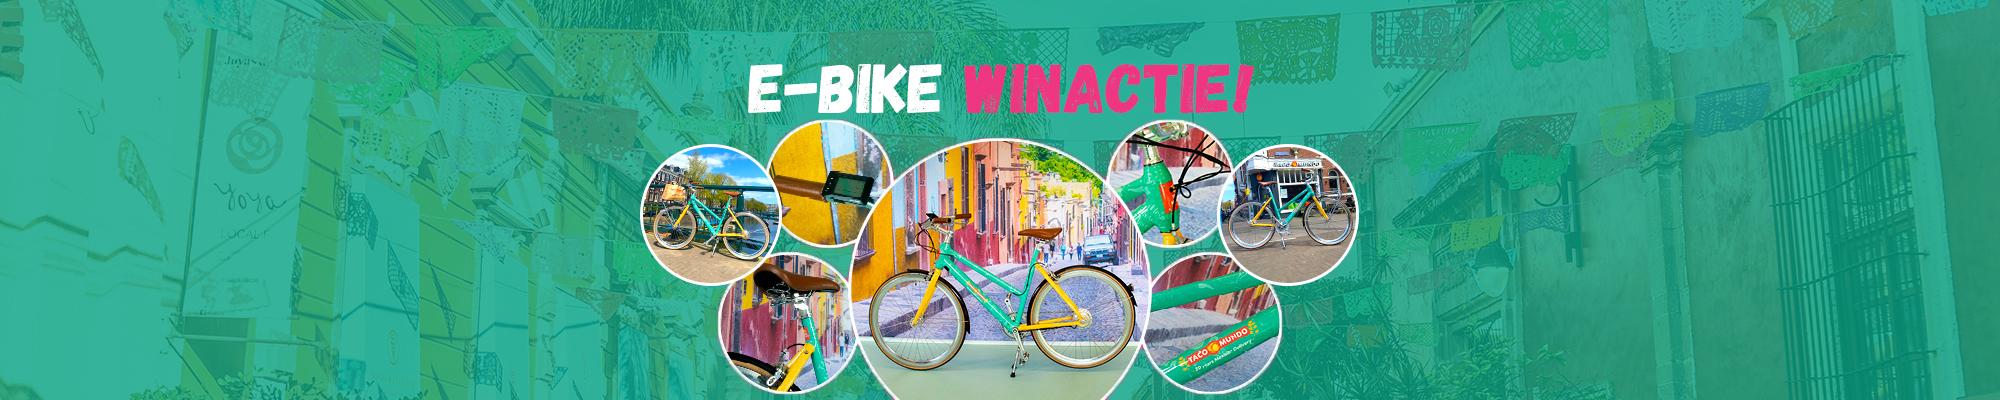 Doe mee en win een unieke Taco Mundo E-Bike